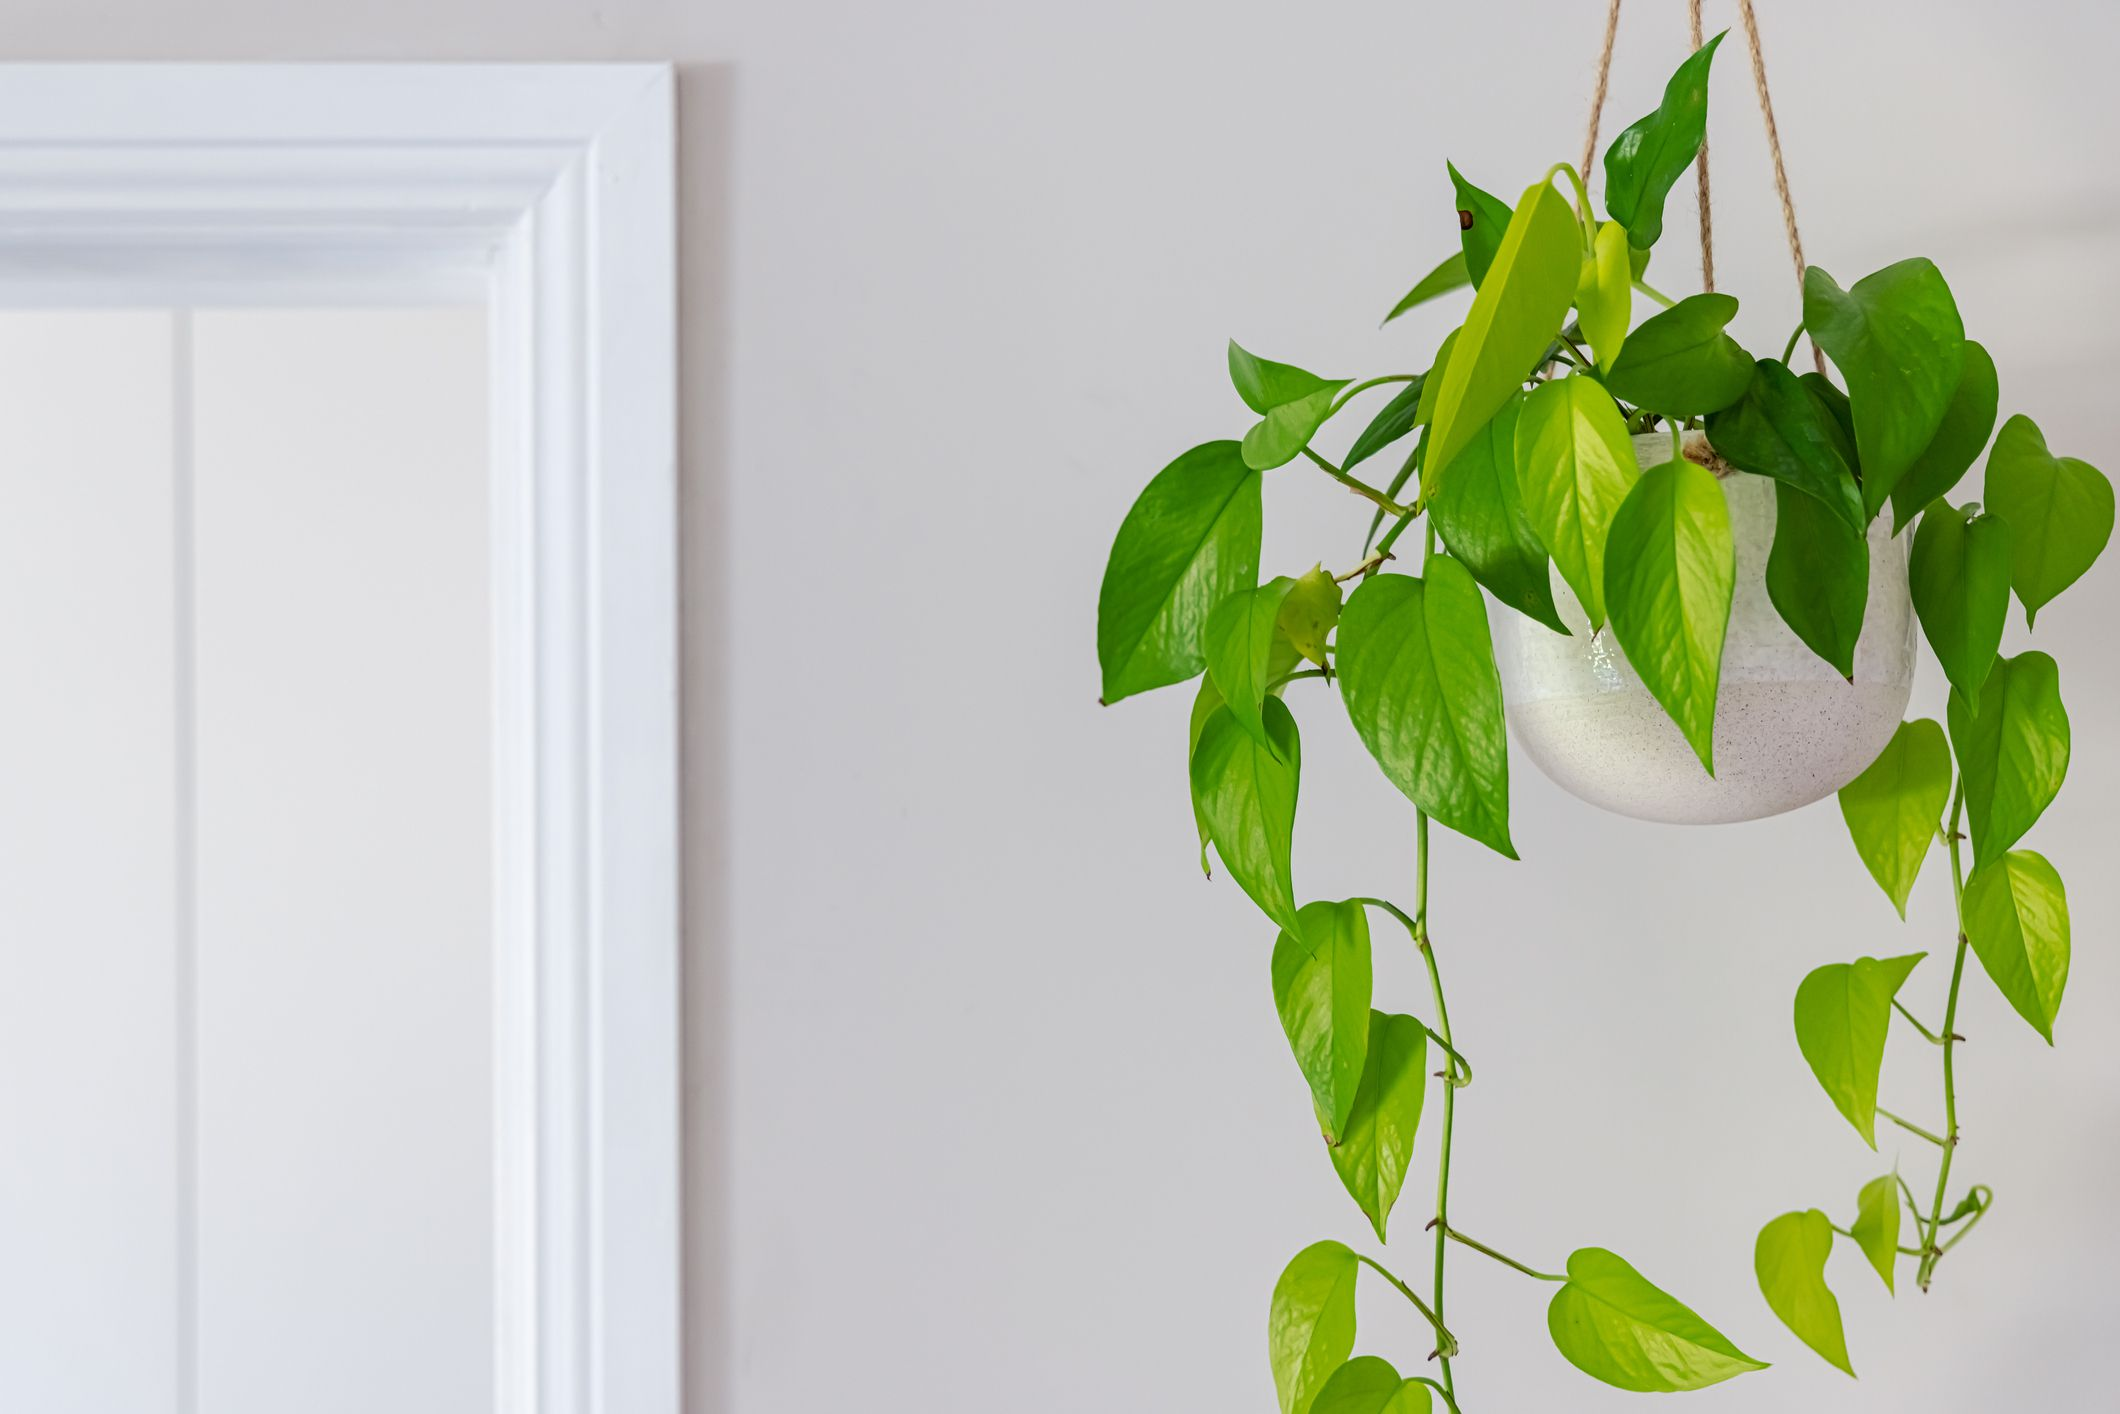 Vining pothos (Epipremnum aureum) in a white pot against a grey wall.